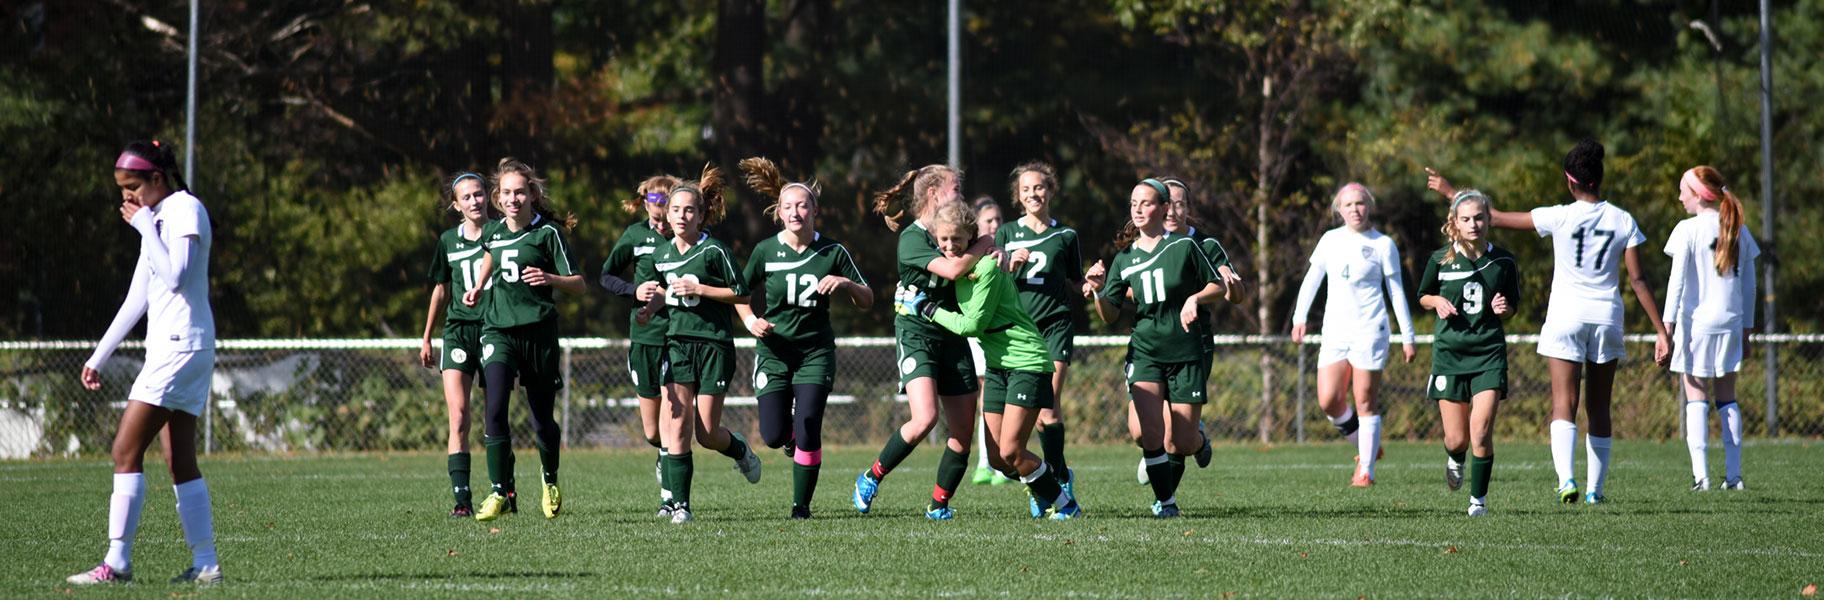 Girls Varsity Soccer at Concord Academy